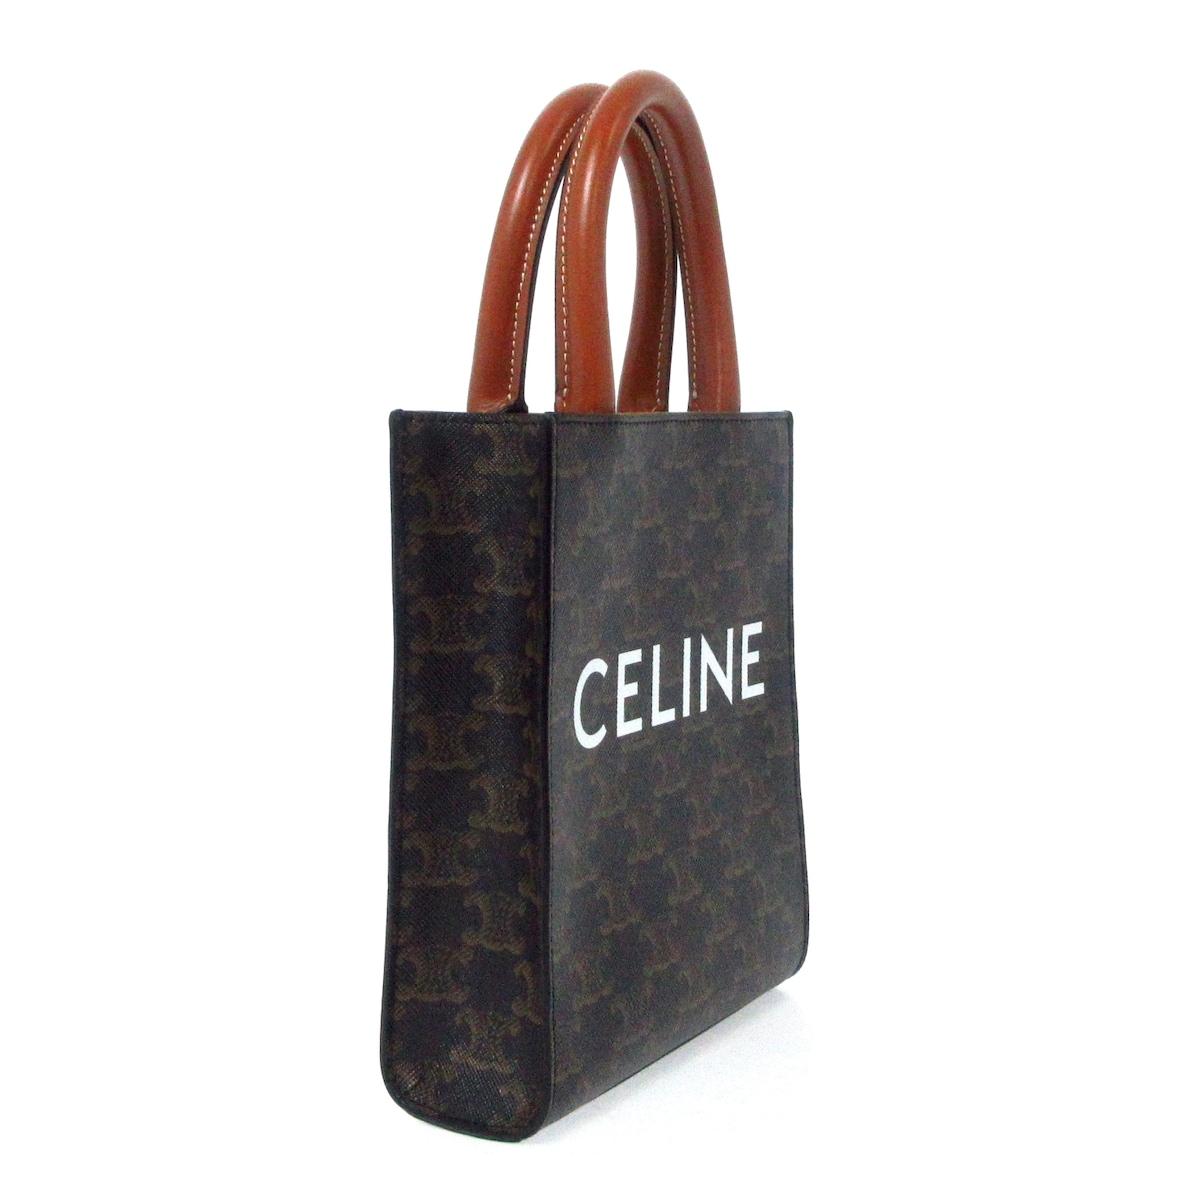 CELINE(セリーヌ)のミニ バーティカルカバ/トリオンフ キャンバス